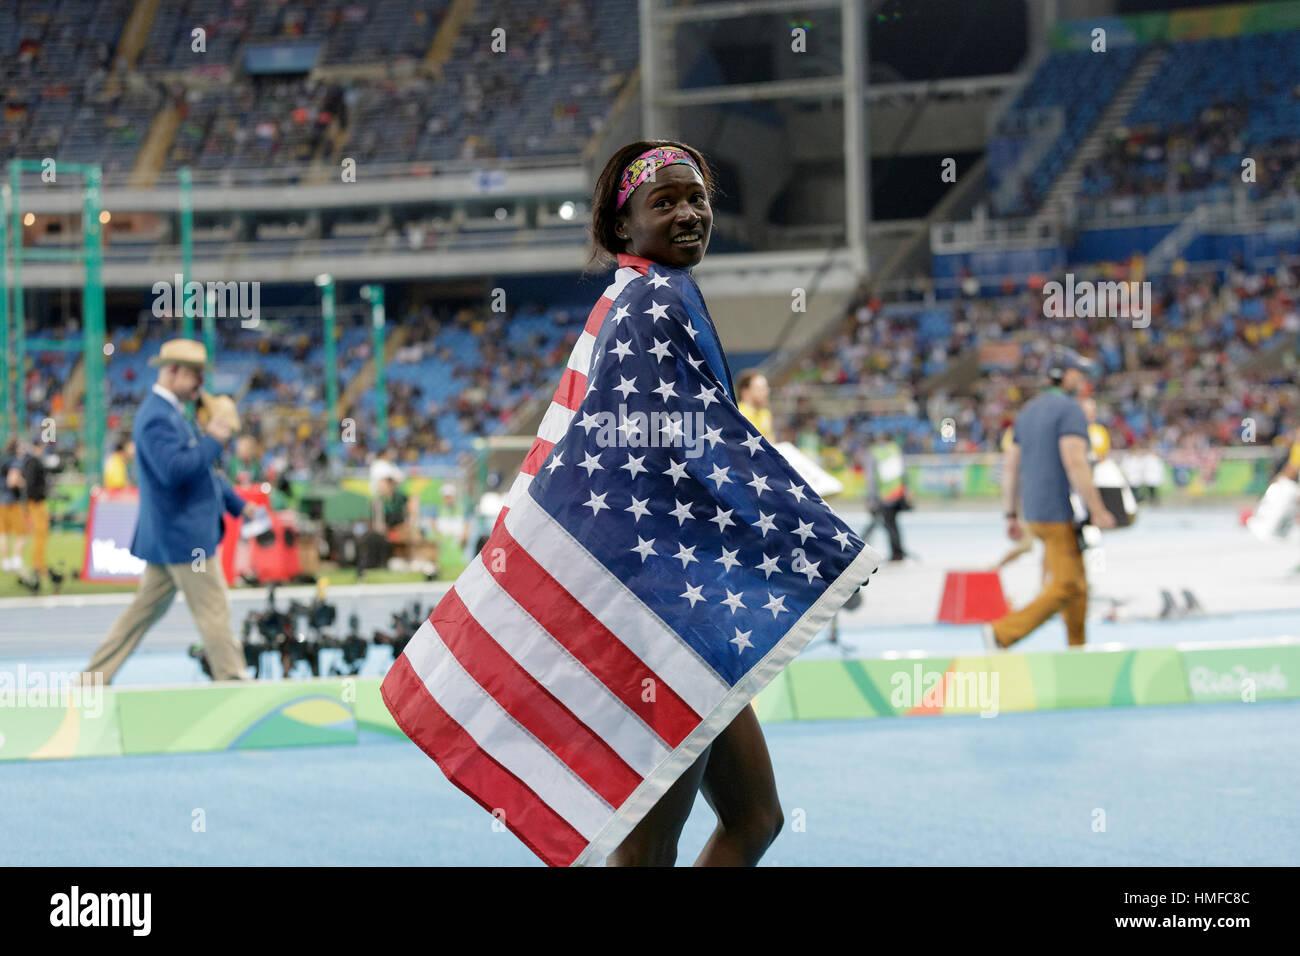 Rio de Janeiro, Brasile. 13 agosto 2016 Tori Bowie (USA) vince la medaglia d argento in donne 100m al 2016 Olimpiadi estive. ©Paul J. Sutton/PC Foto Stock